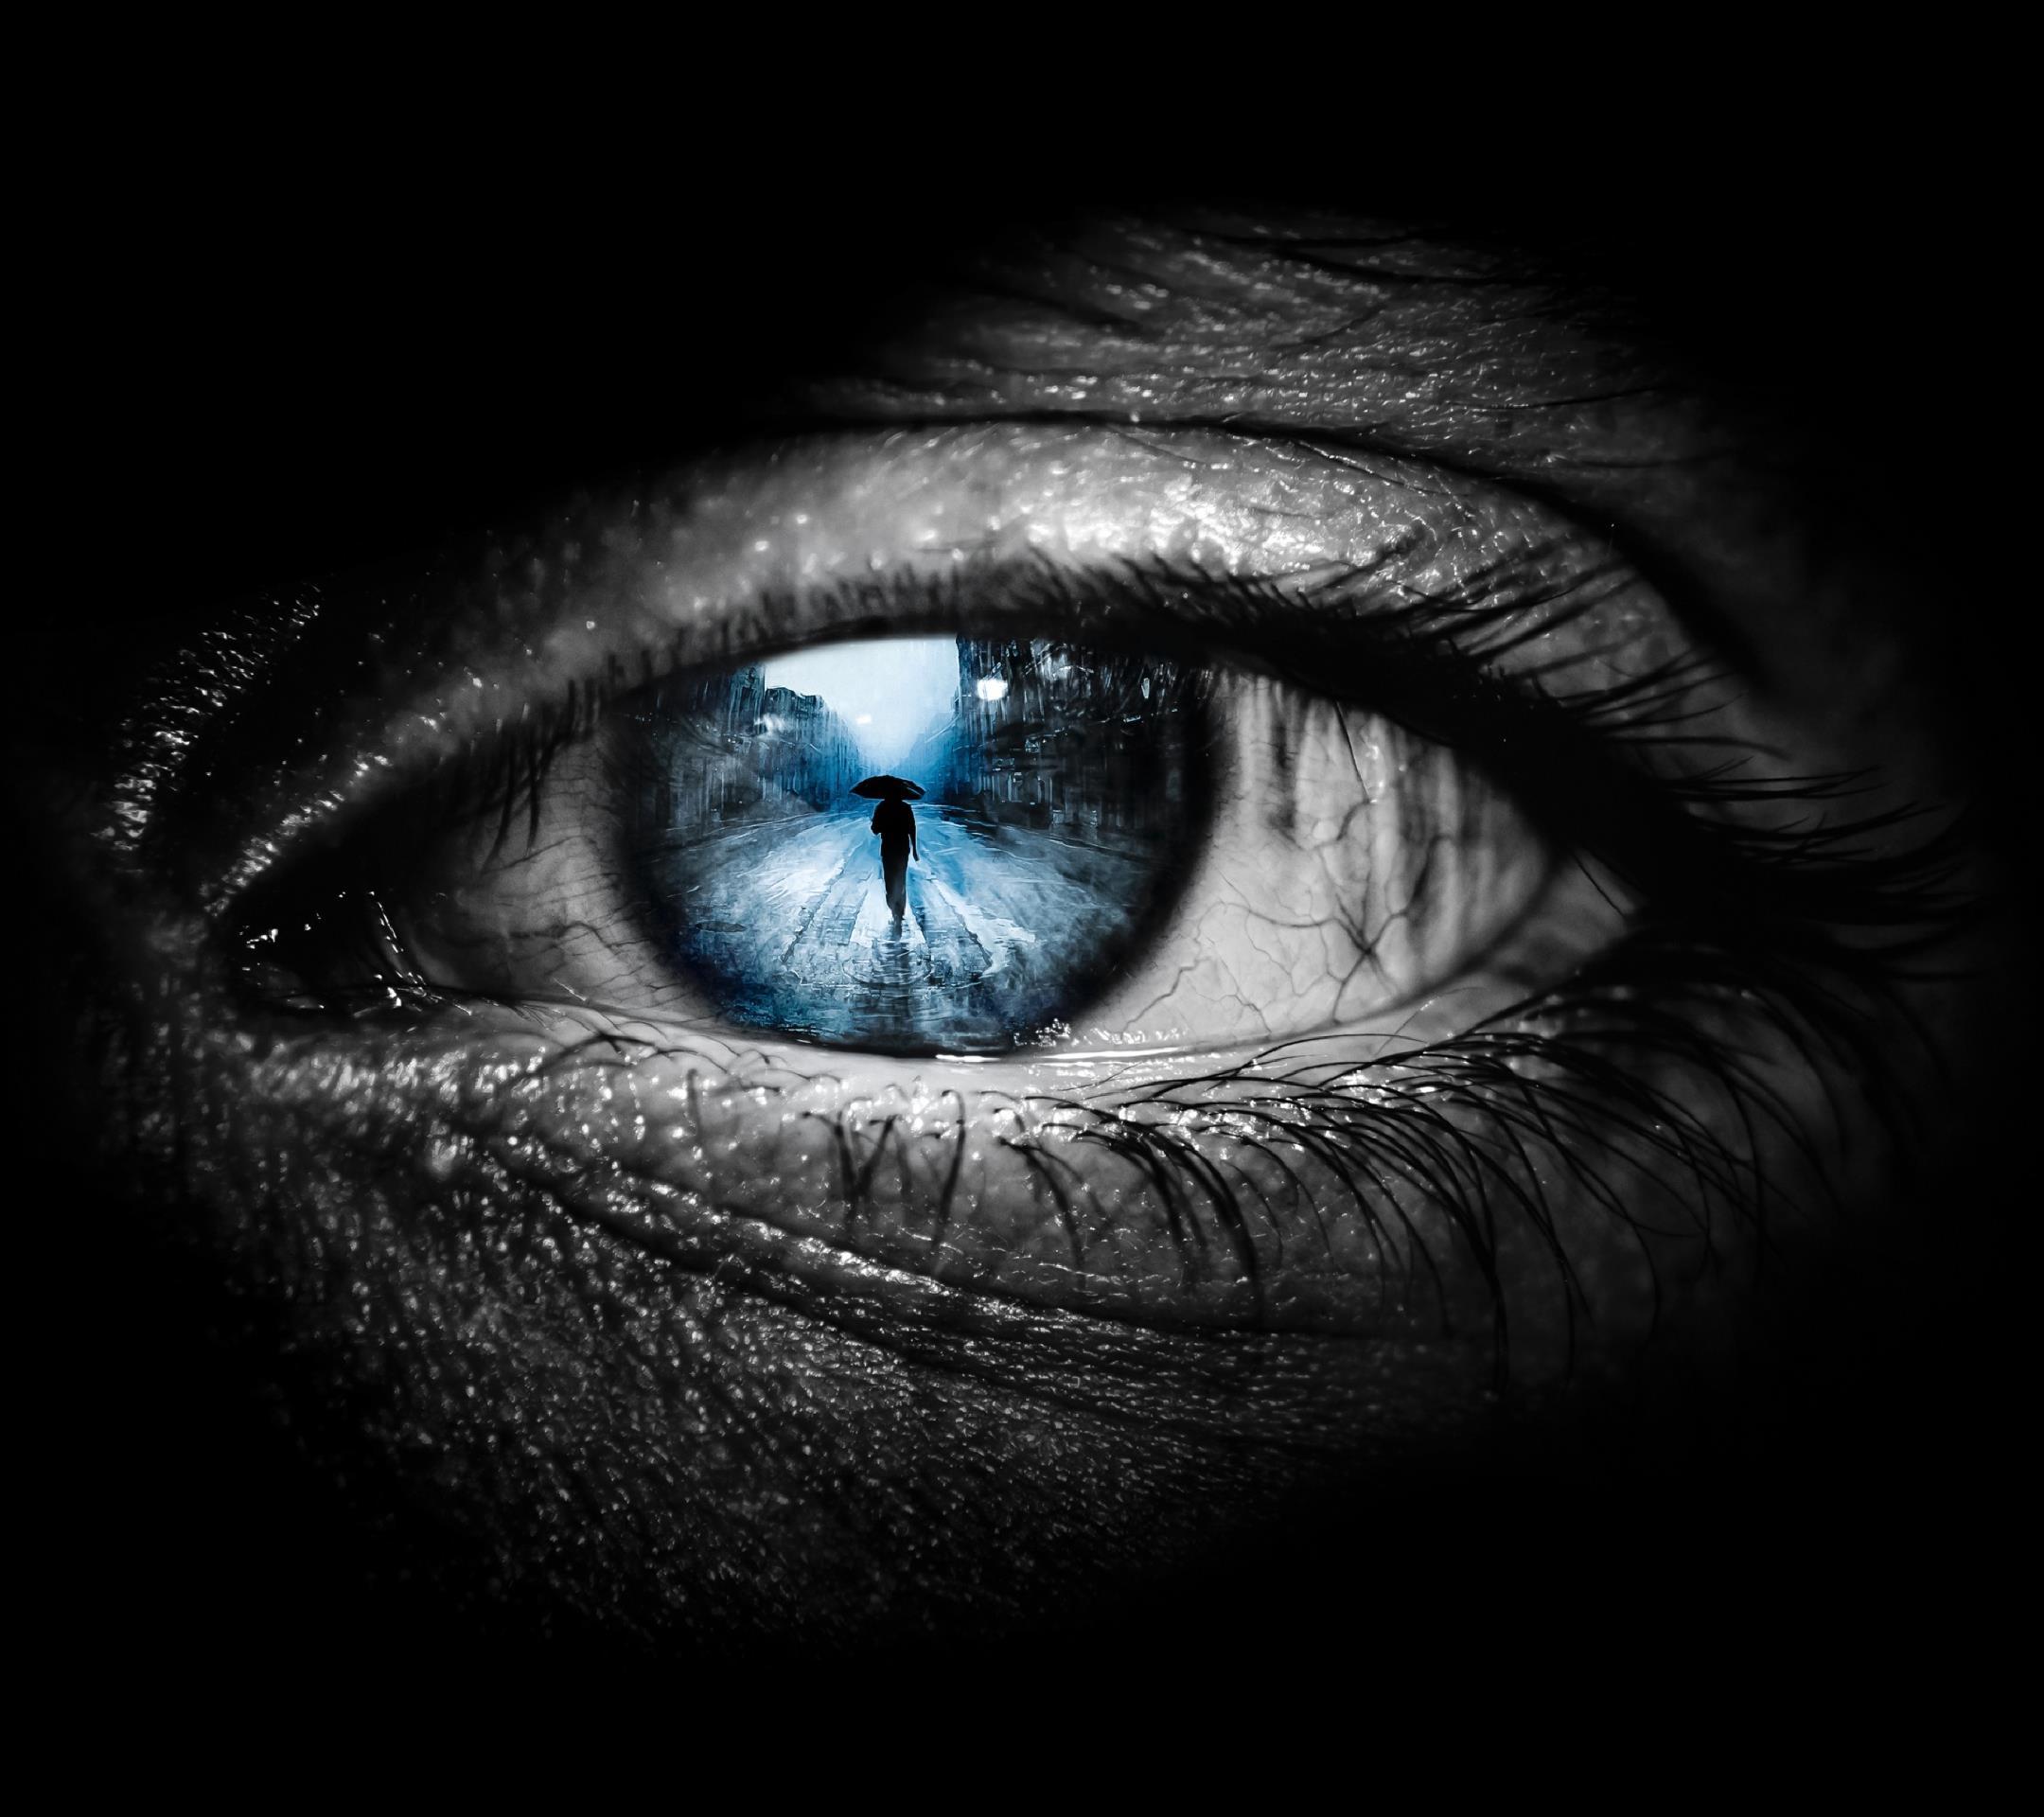 Blue Eye wallpaper 10522955